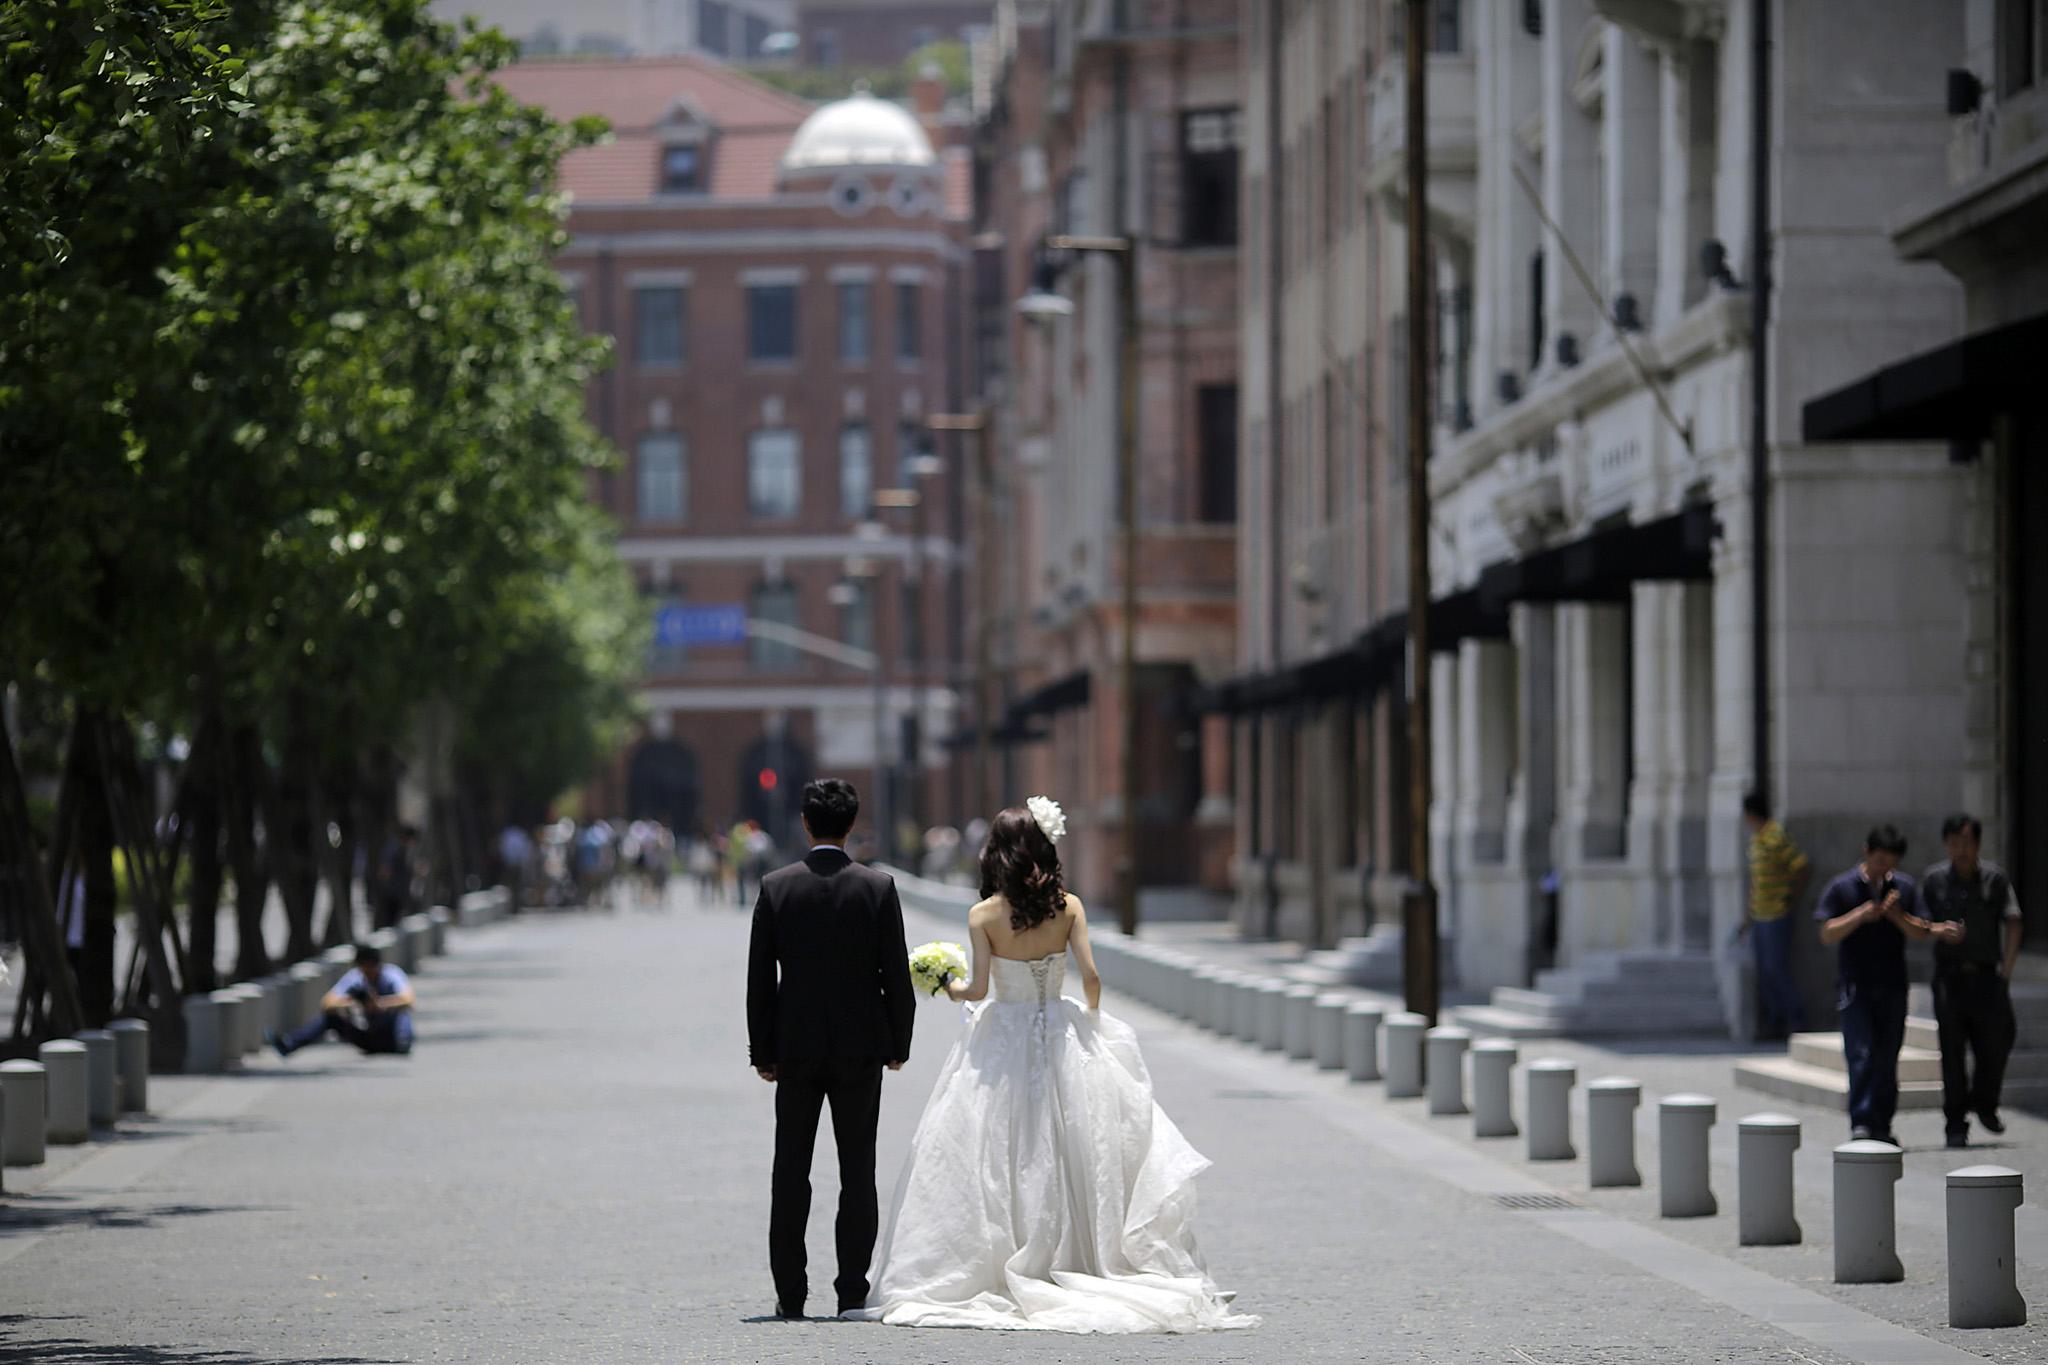 Família | Aldeia estabelece limite para dotes de casamento